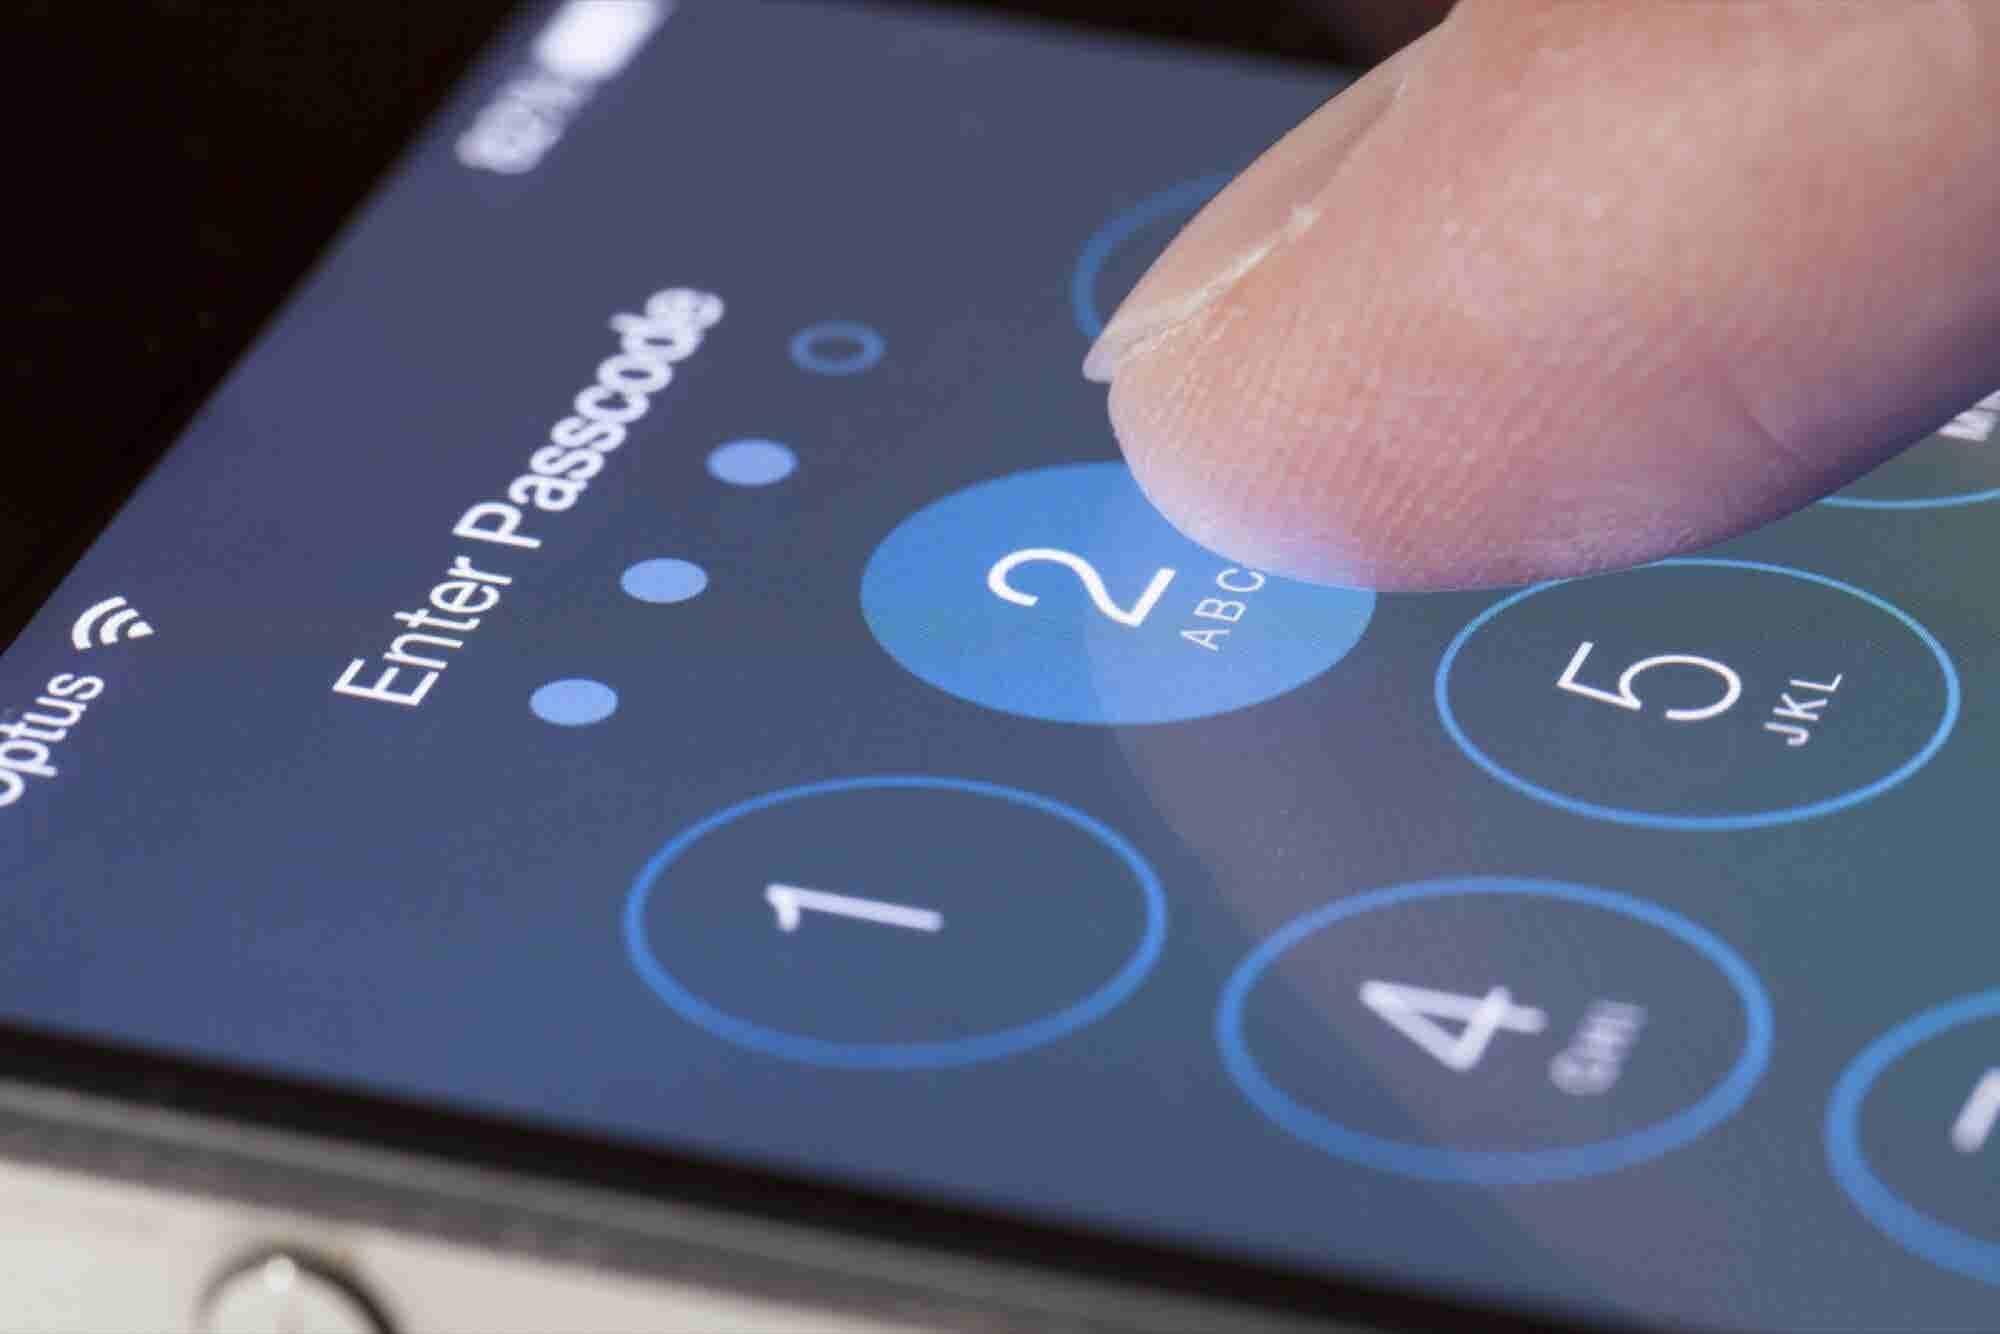 Entrepreneur Readers Chime in on Apple's Refusal to Unlock Shooter's iPhone